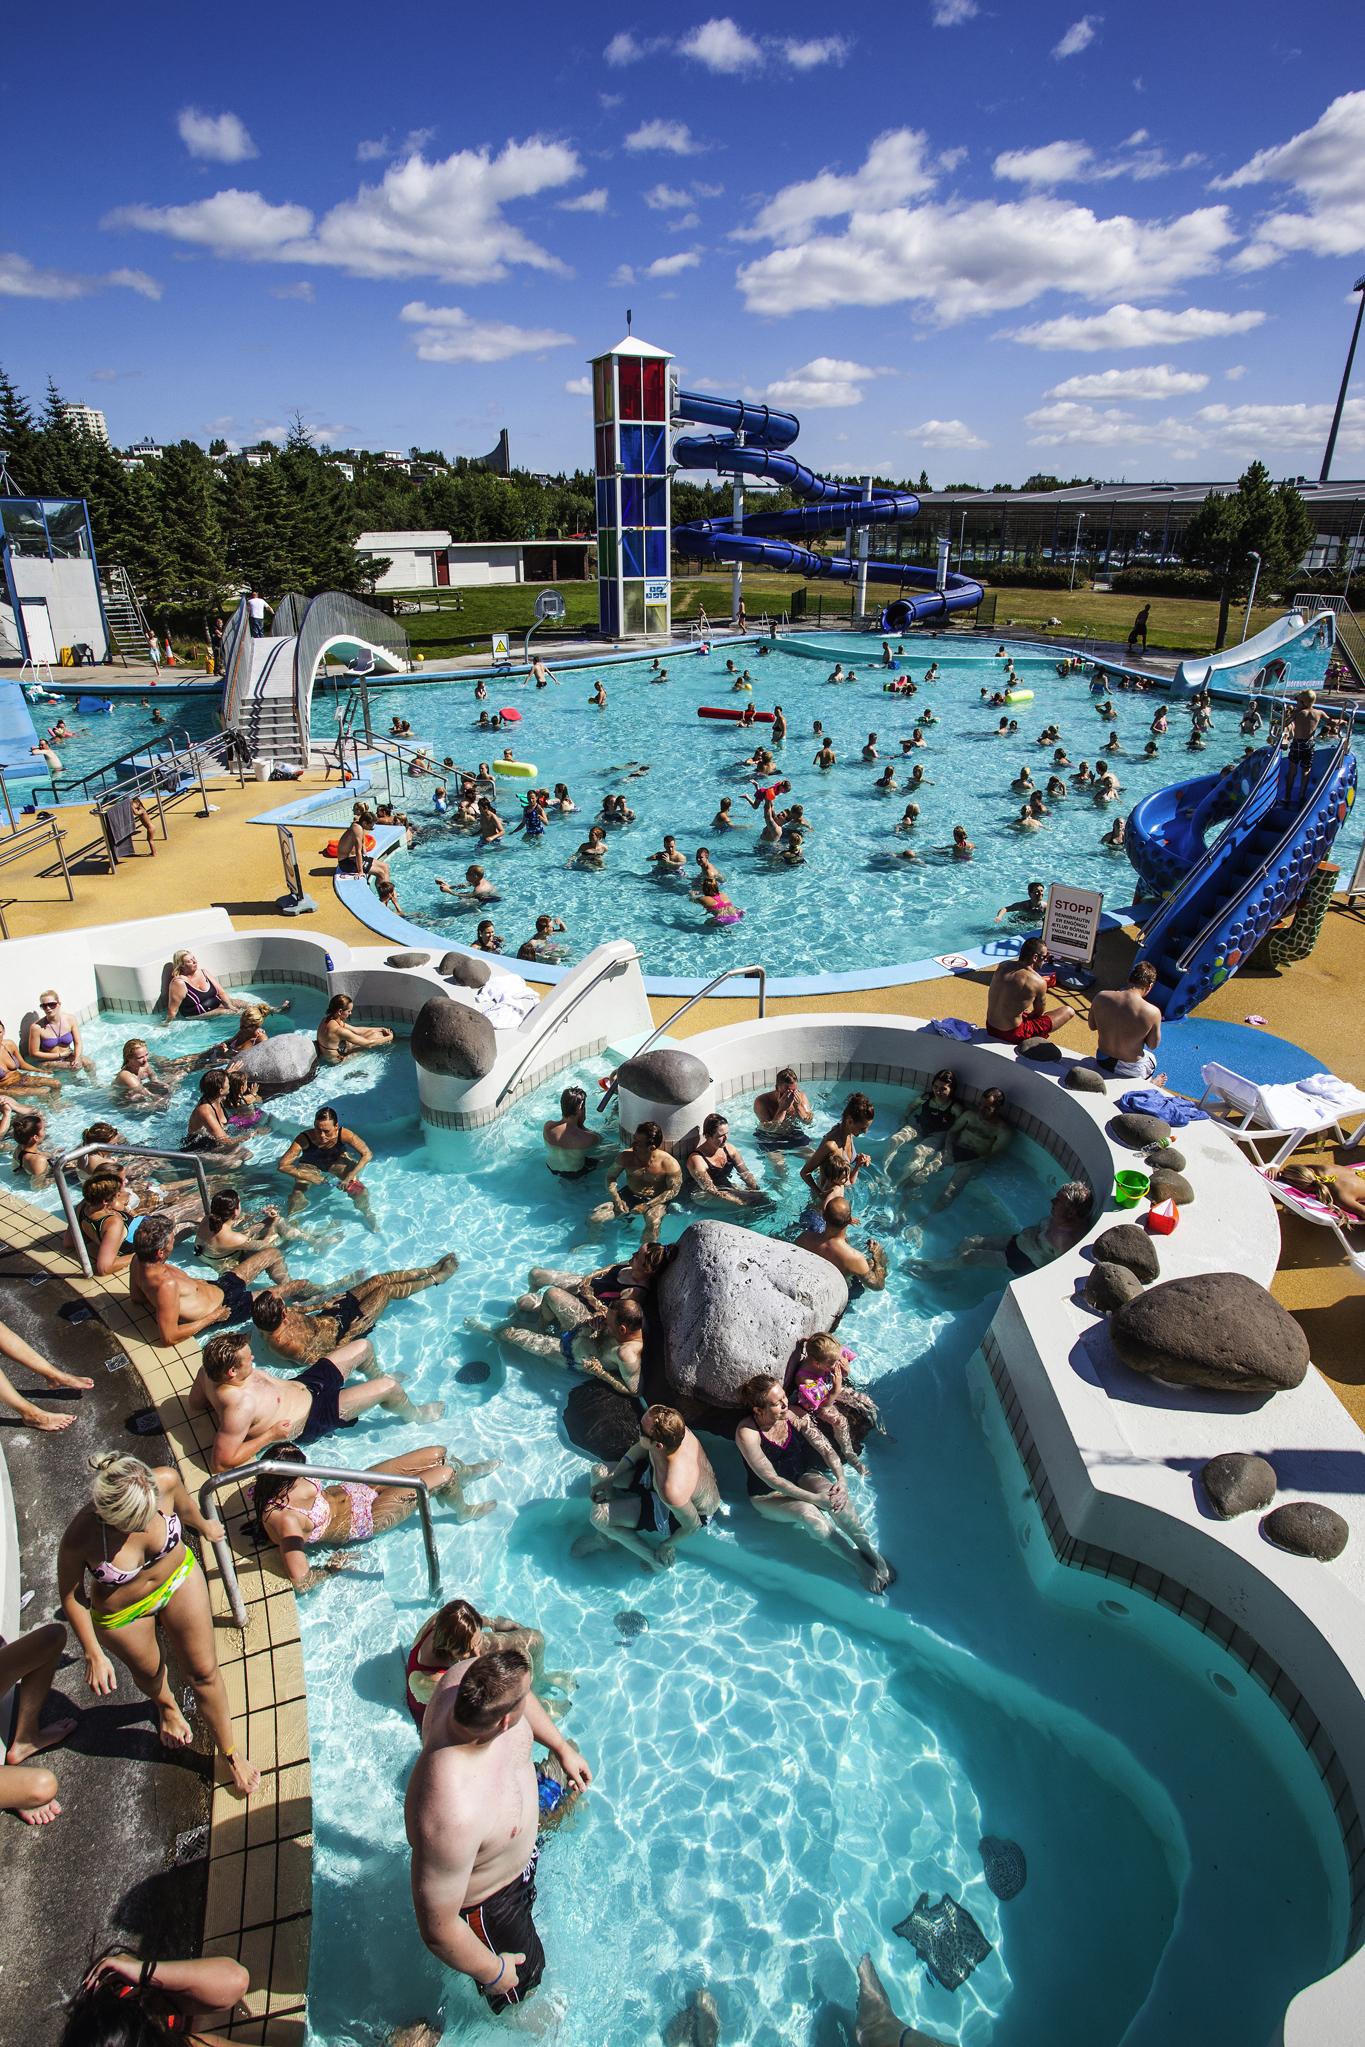 Operating Public Swimming Pools